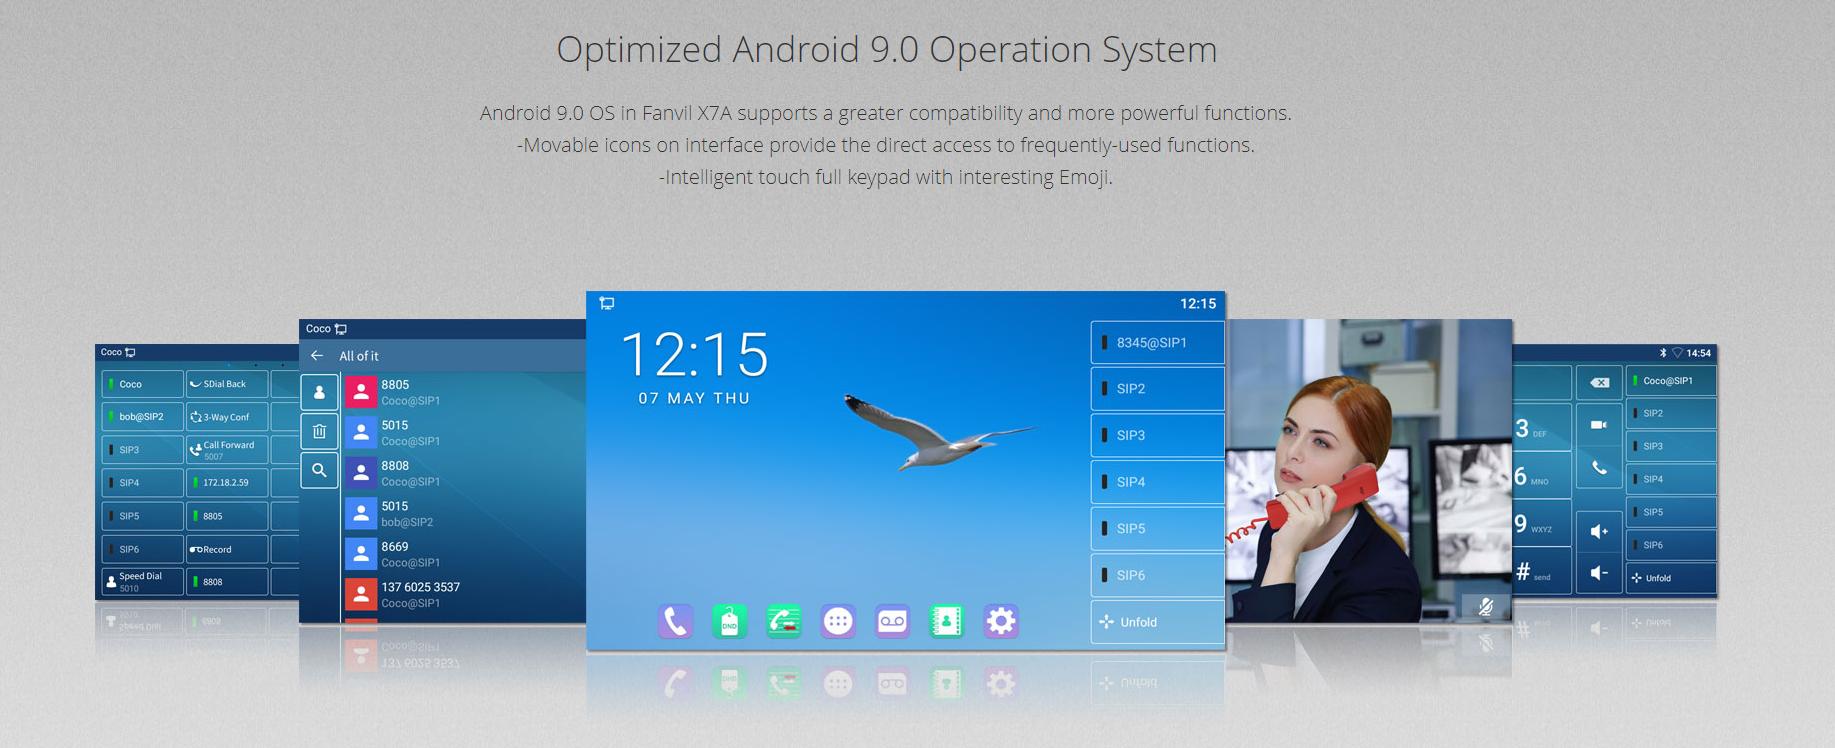 Fanvil X7A Android IP Phone with Camera - Hong Kong Distributor - 香港代理